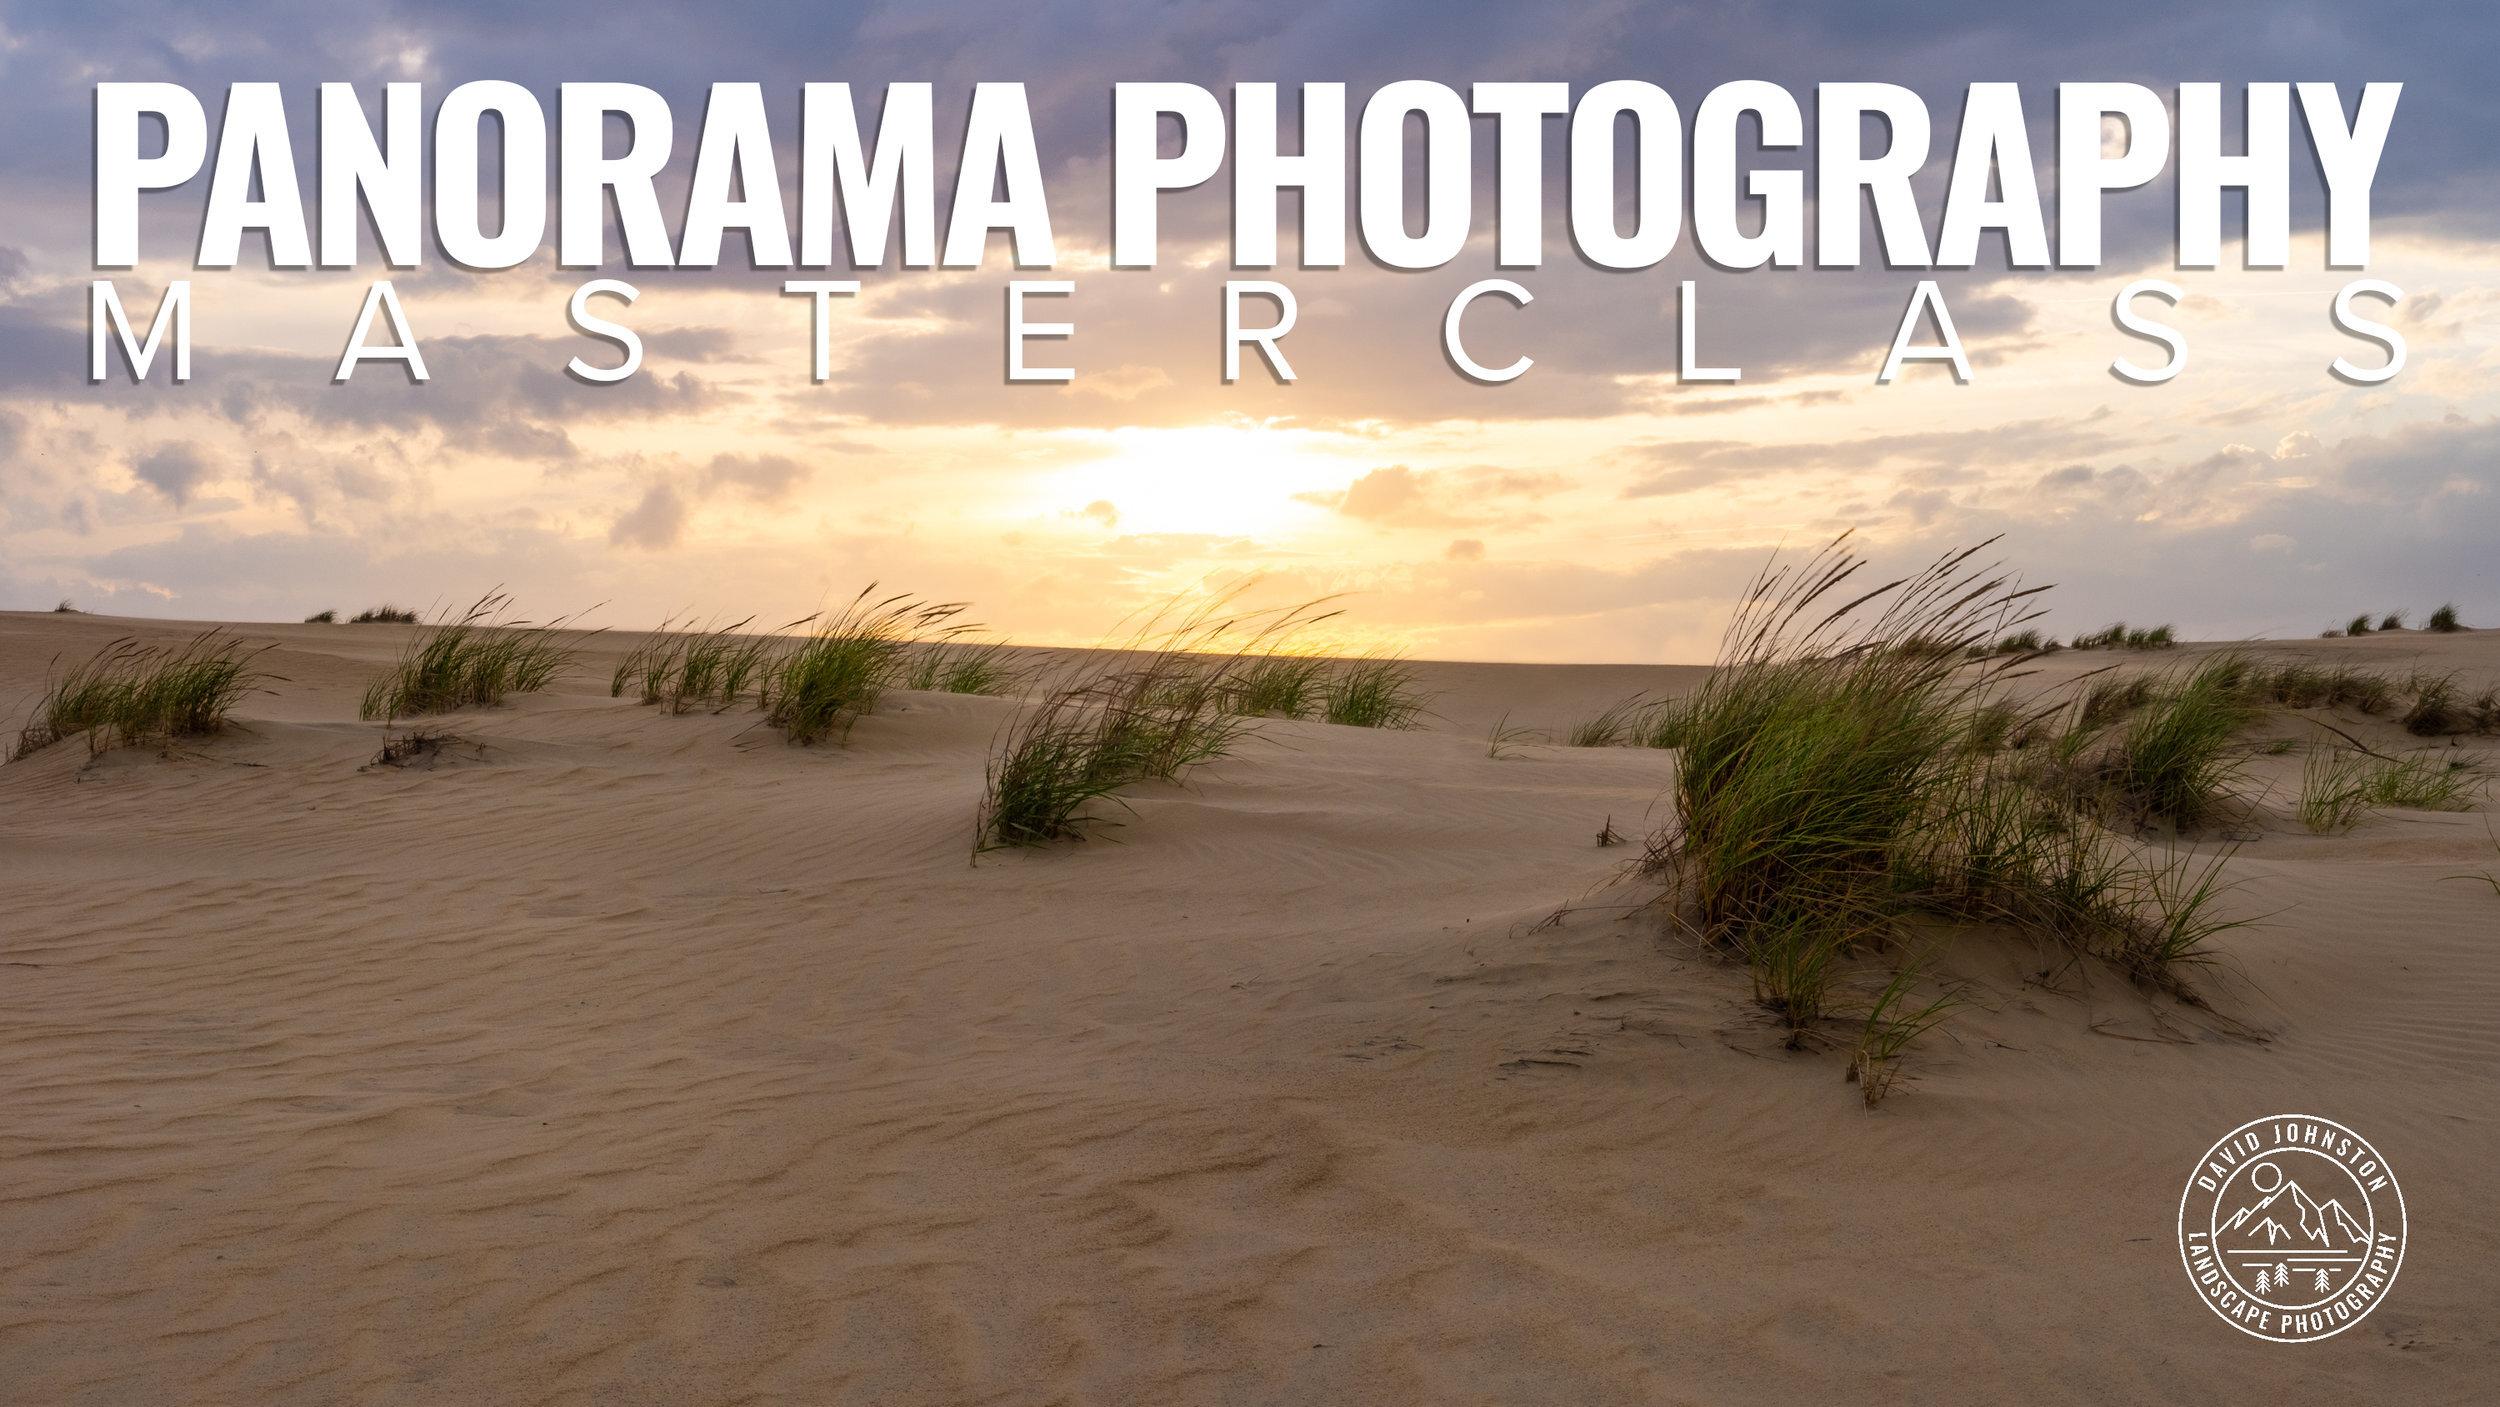 Panorama+Photography+Masterclass+Image.jpg